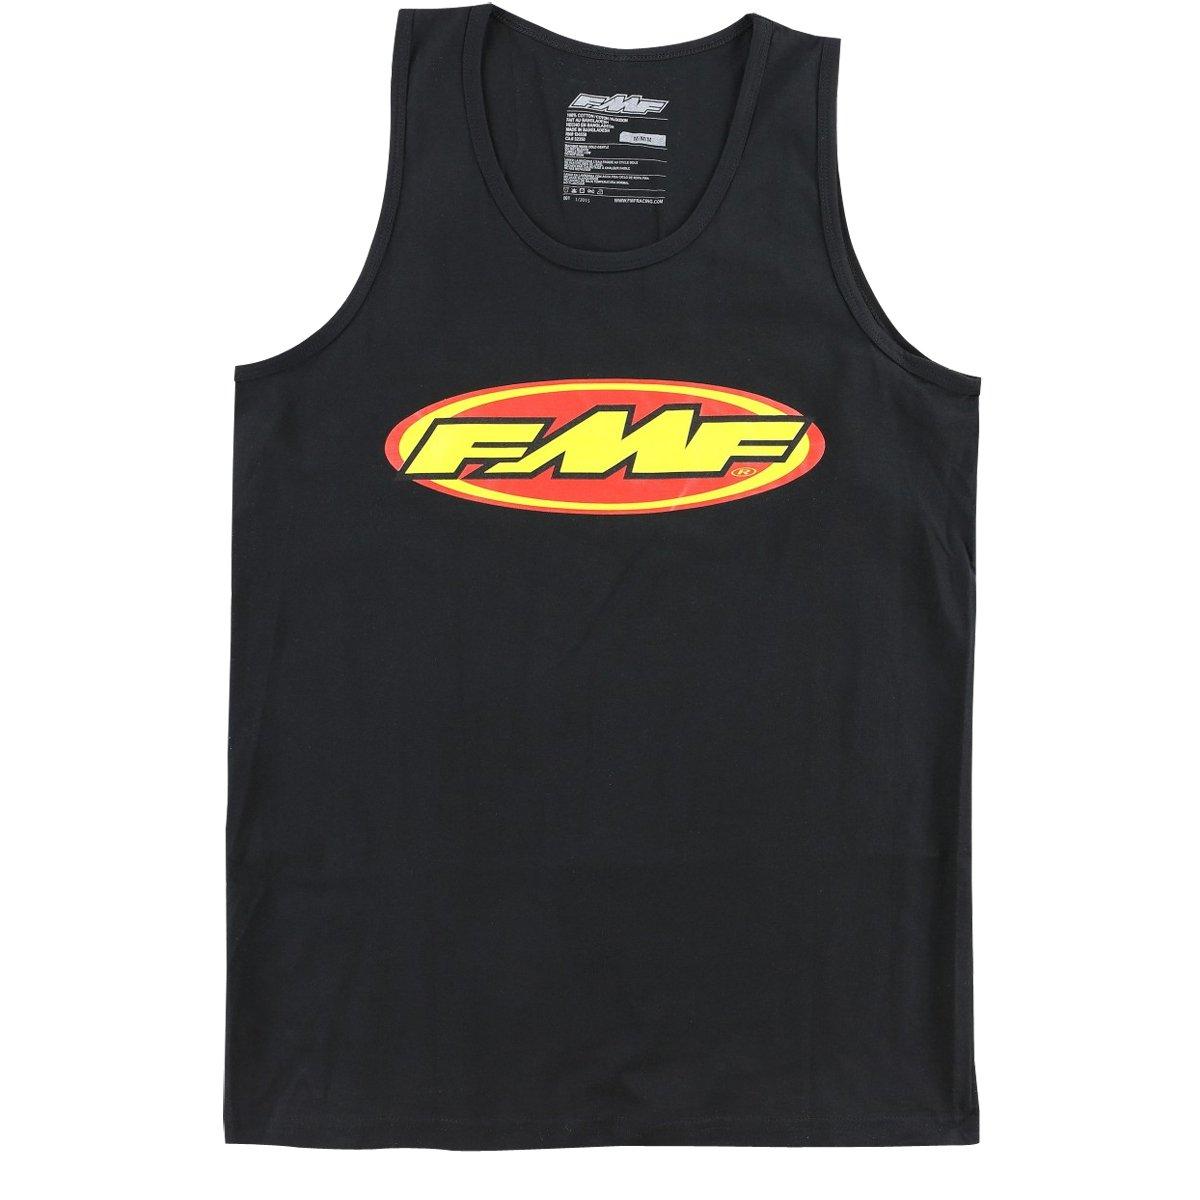 FMF F251S23102BLKL Men's The Don Tank Top (Black, Large) by FMF (Image #1)